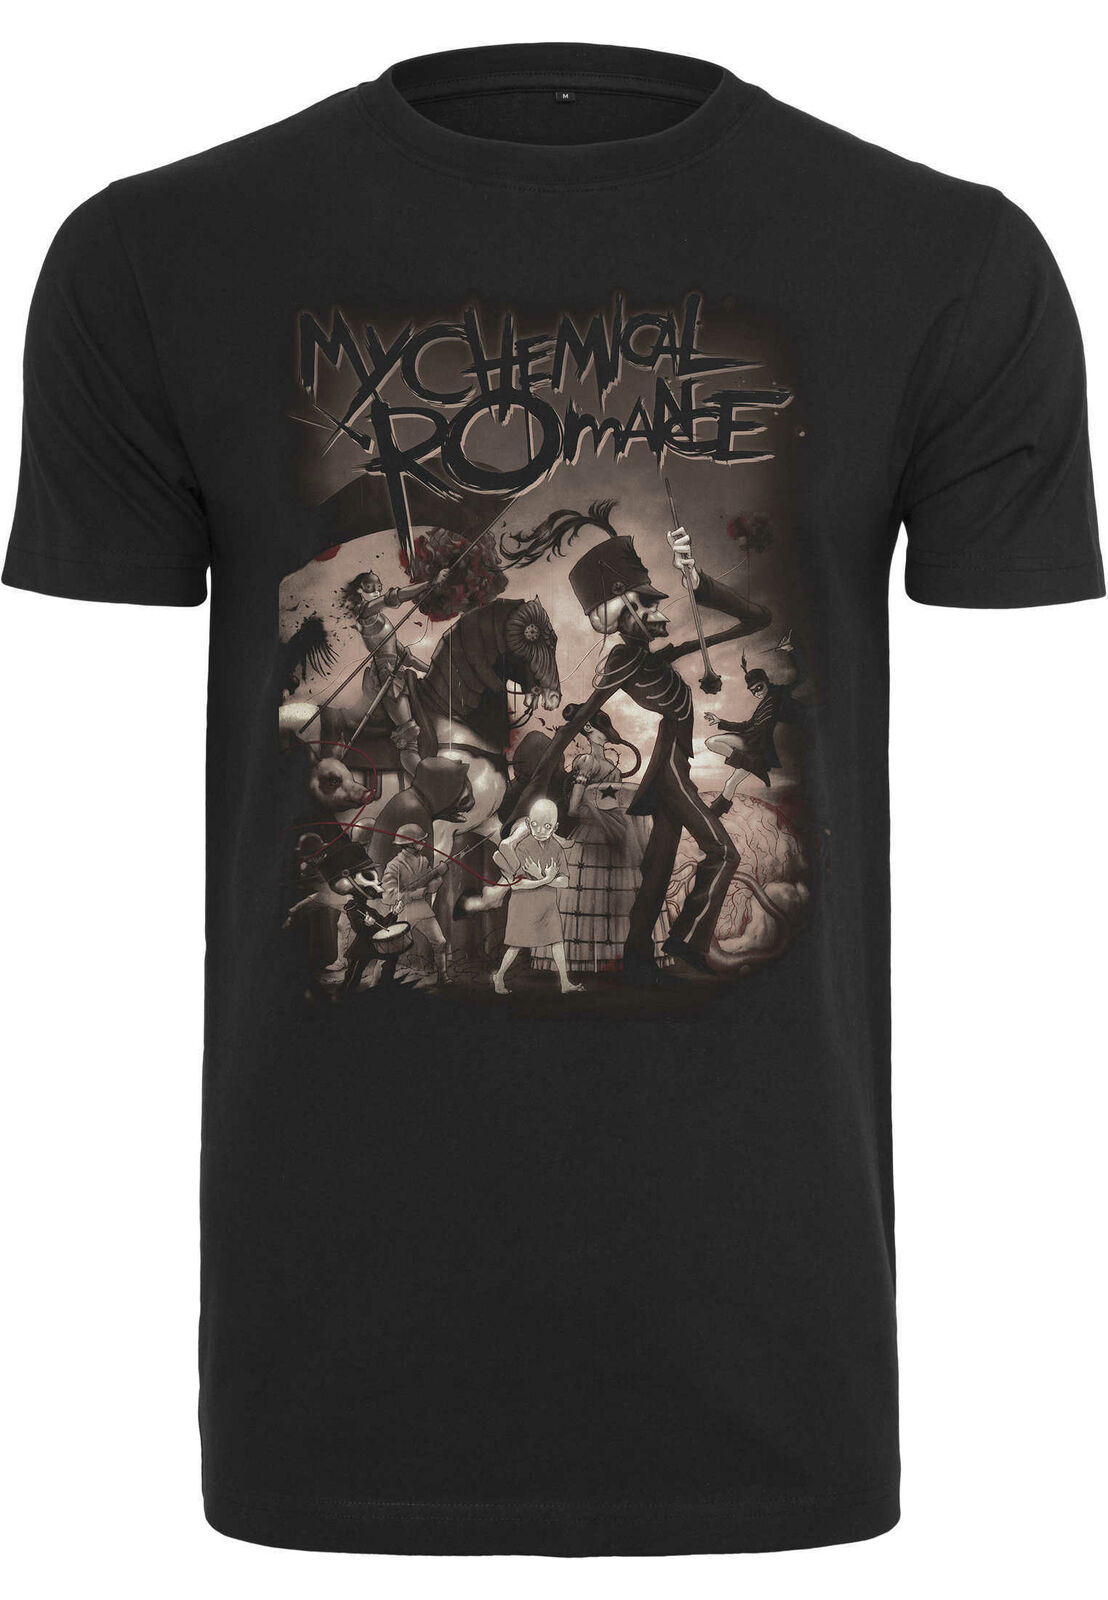 Camiseta con stampa meu romance químico no desfile merchcode moda camisas uomo